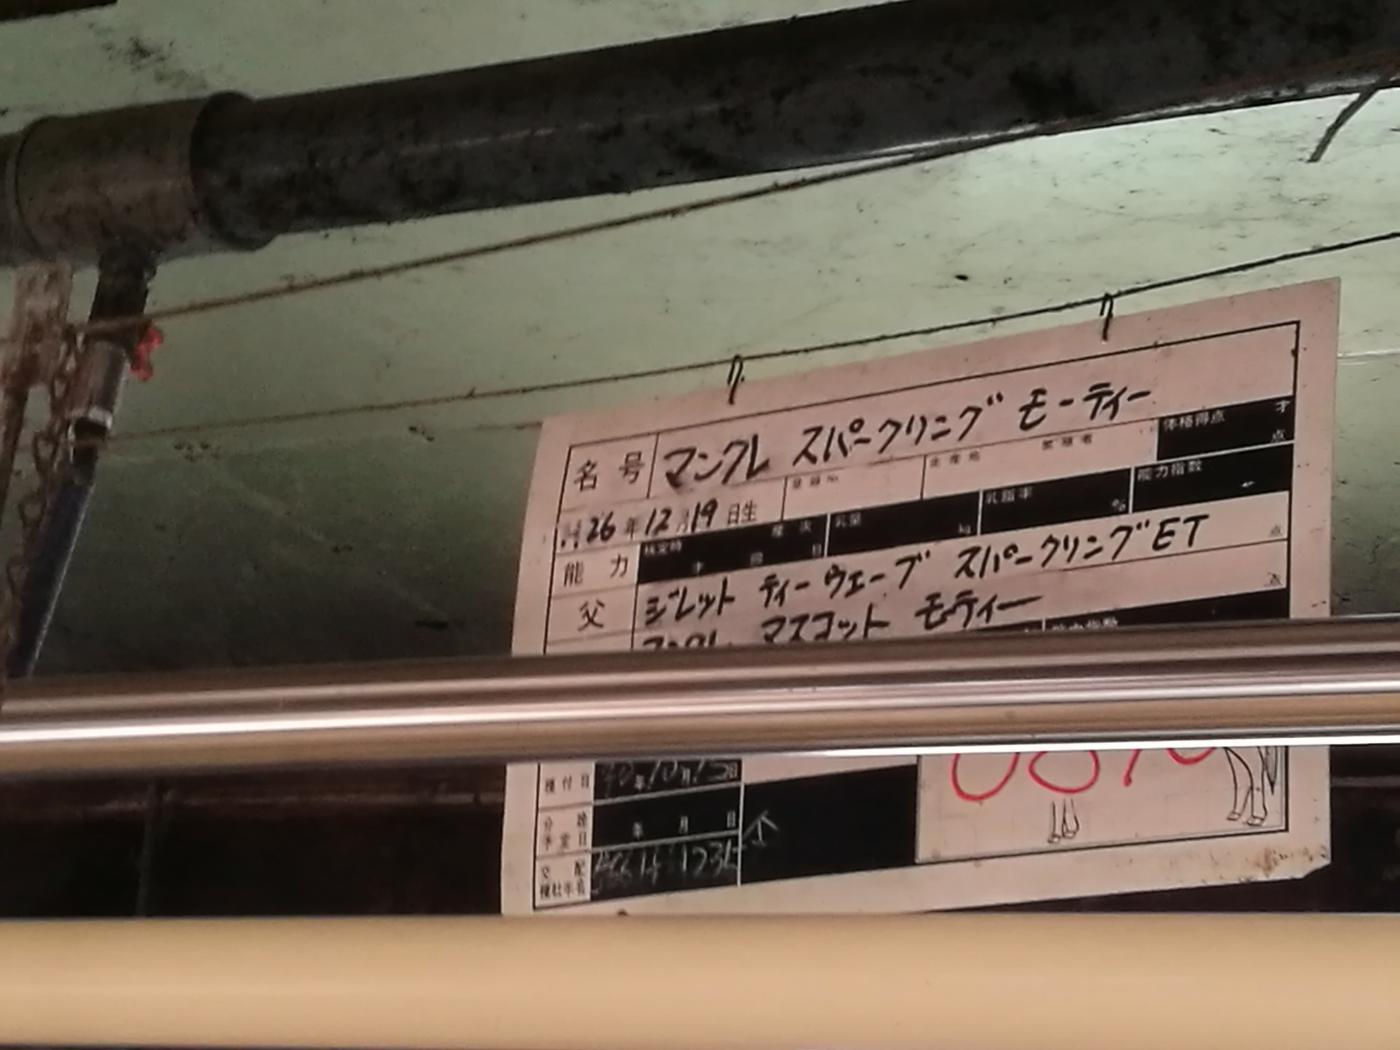 北海道忠類地区石黒牧場 牛舎プレート